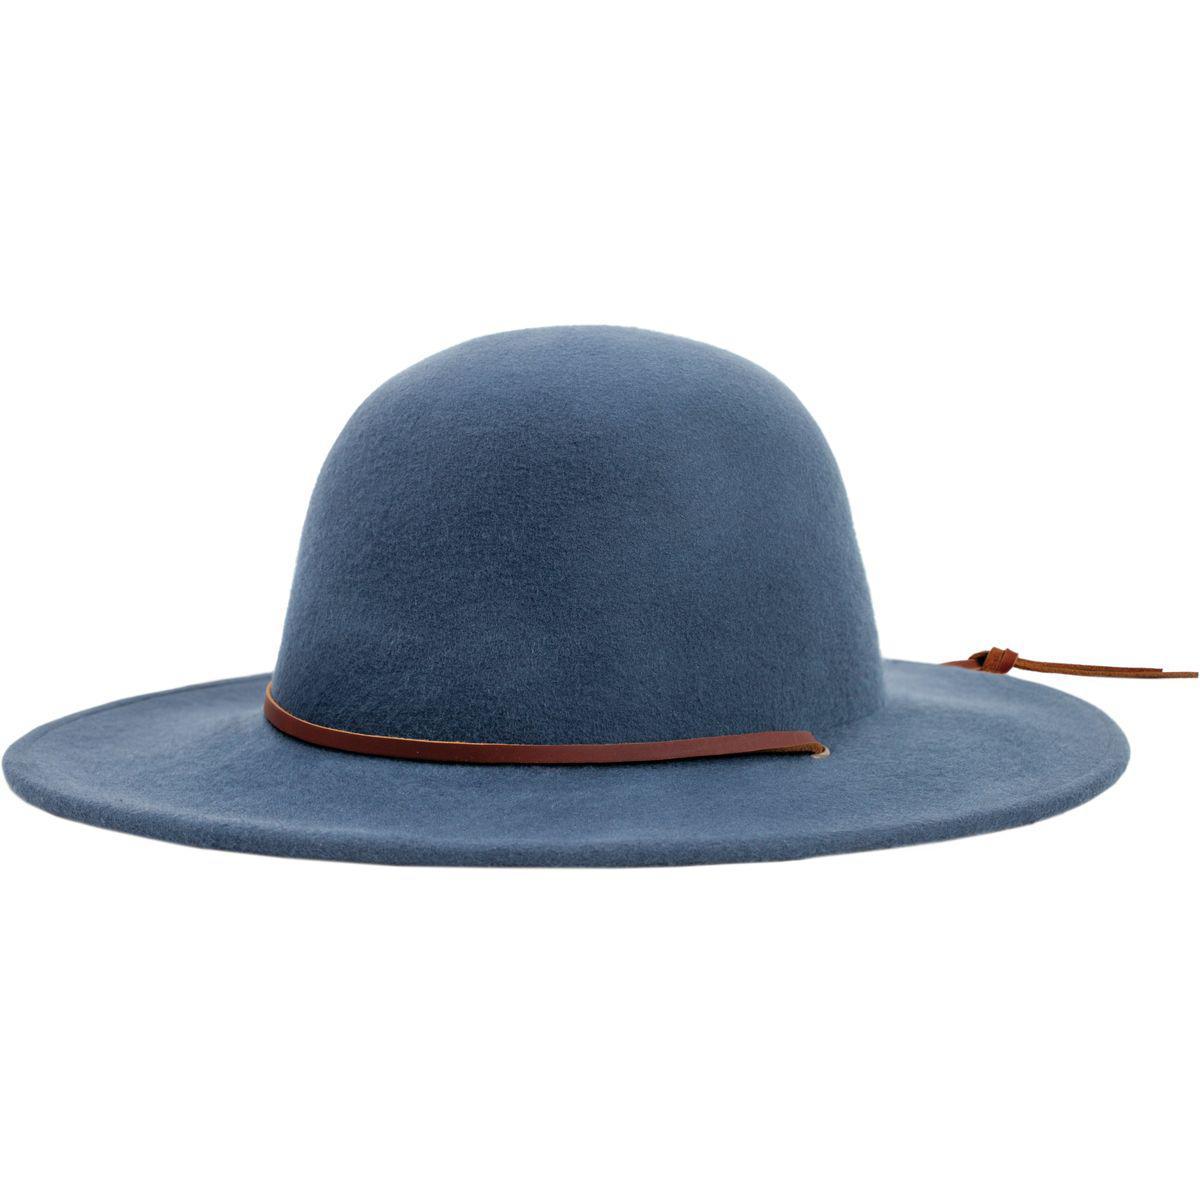 ... village hats. 69a39 81a68  spain lyst brixton tiller hat in blue 7ceec  47fe7 e6a4fd1d6c4f